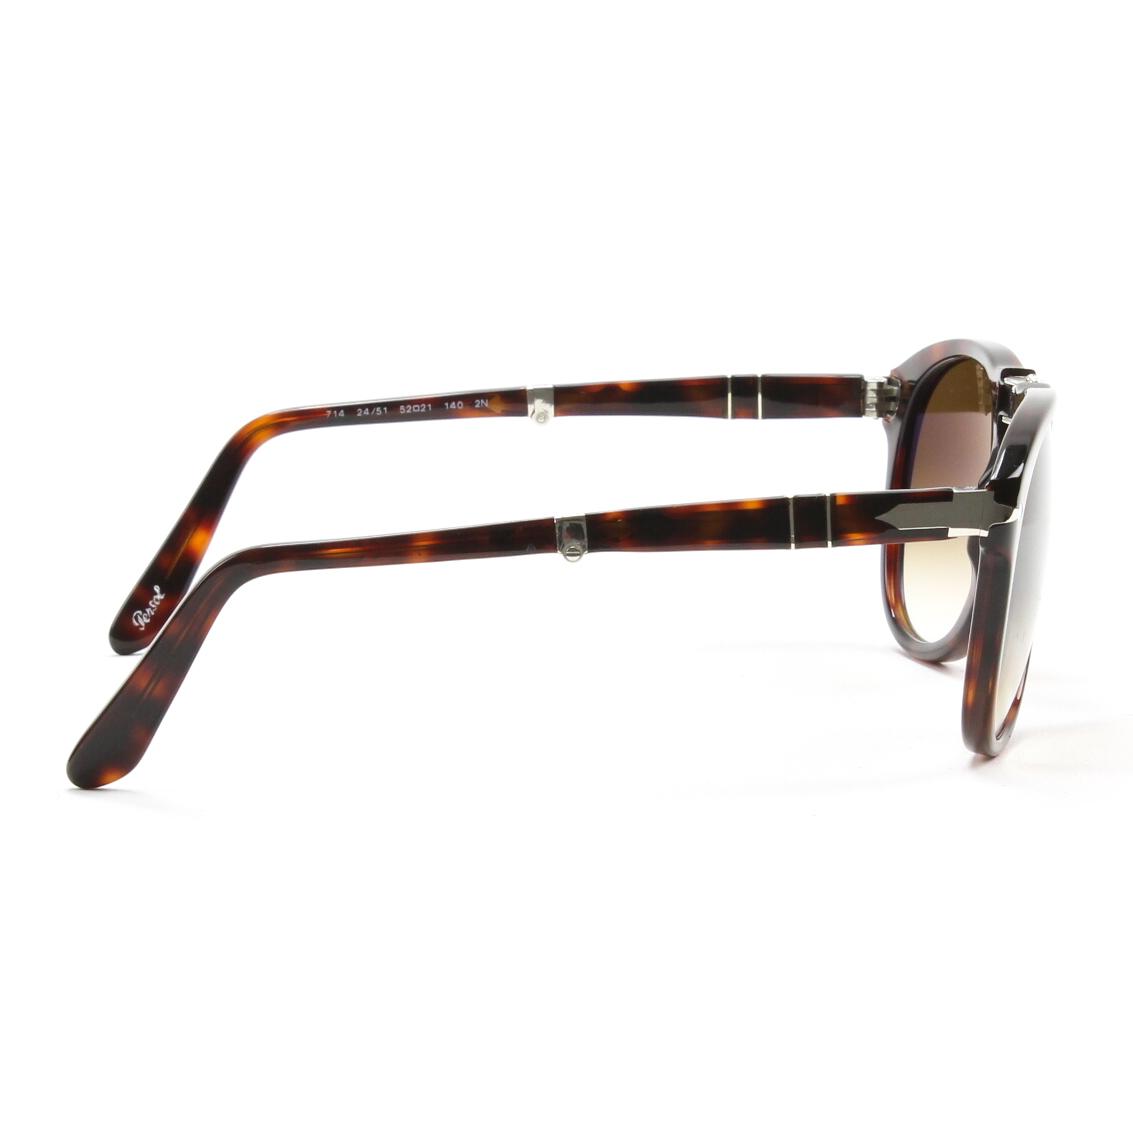 8a54020d834 Persol Folding Glasses Review